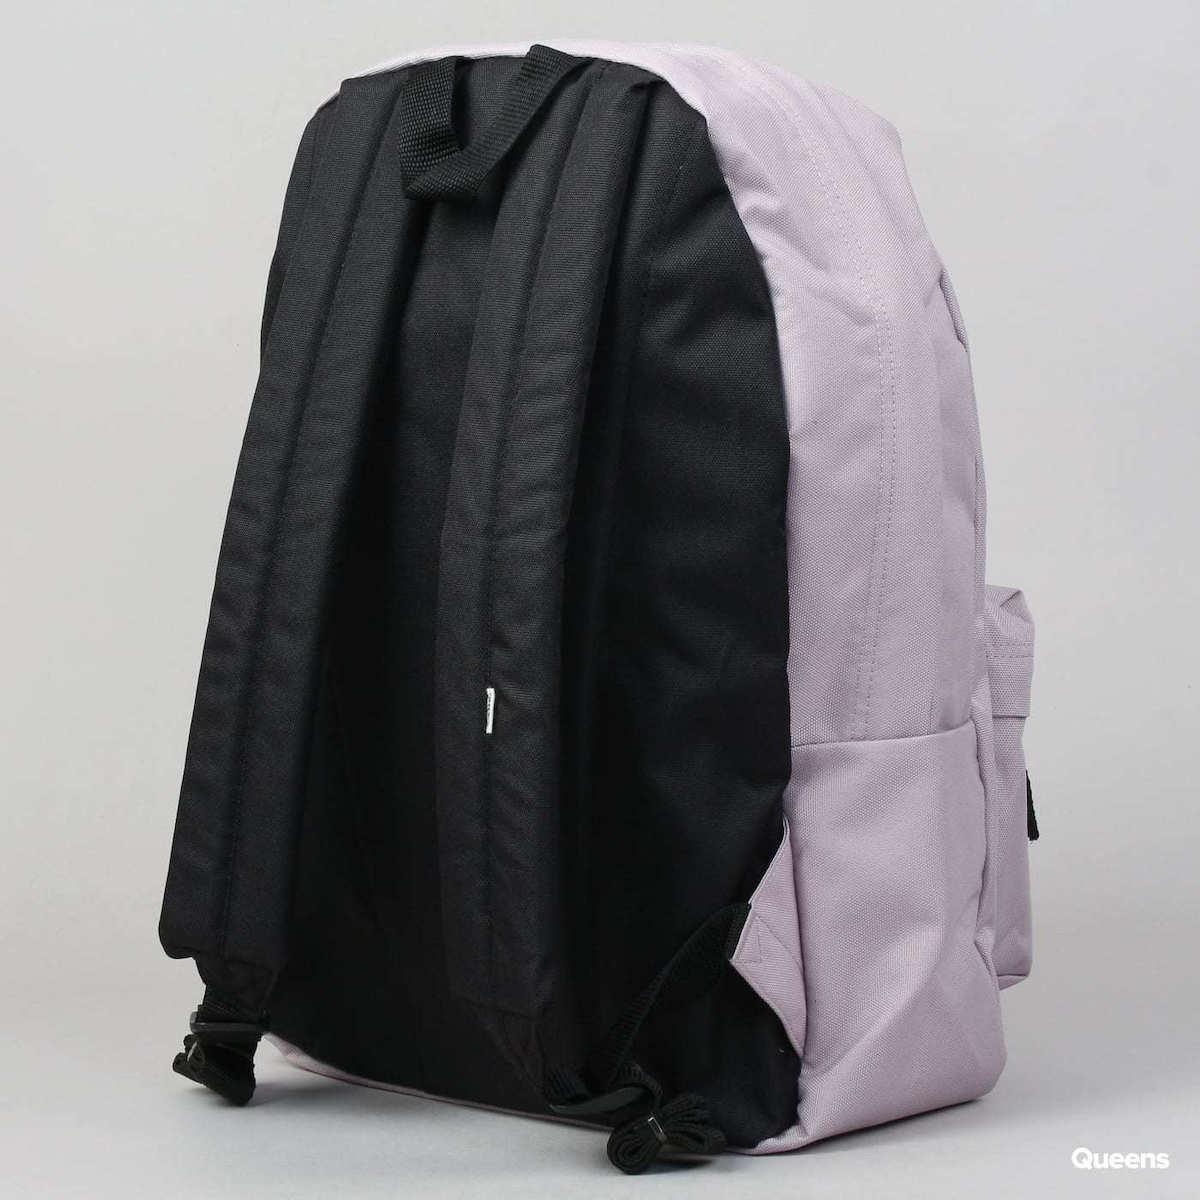 2883c41ed13 Προσθήκη στα αγαπημένα menu Vans Realm Backpack. Vans Realm Backpack; Vans  Realm Backpack; Vans Realm Backpack